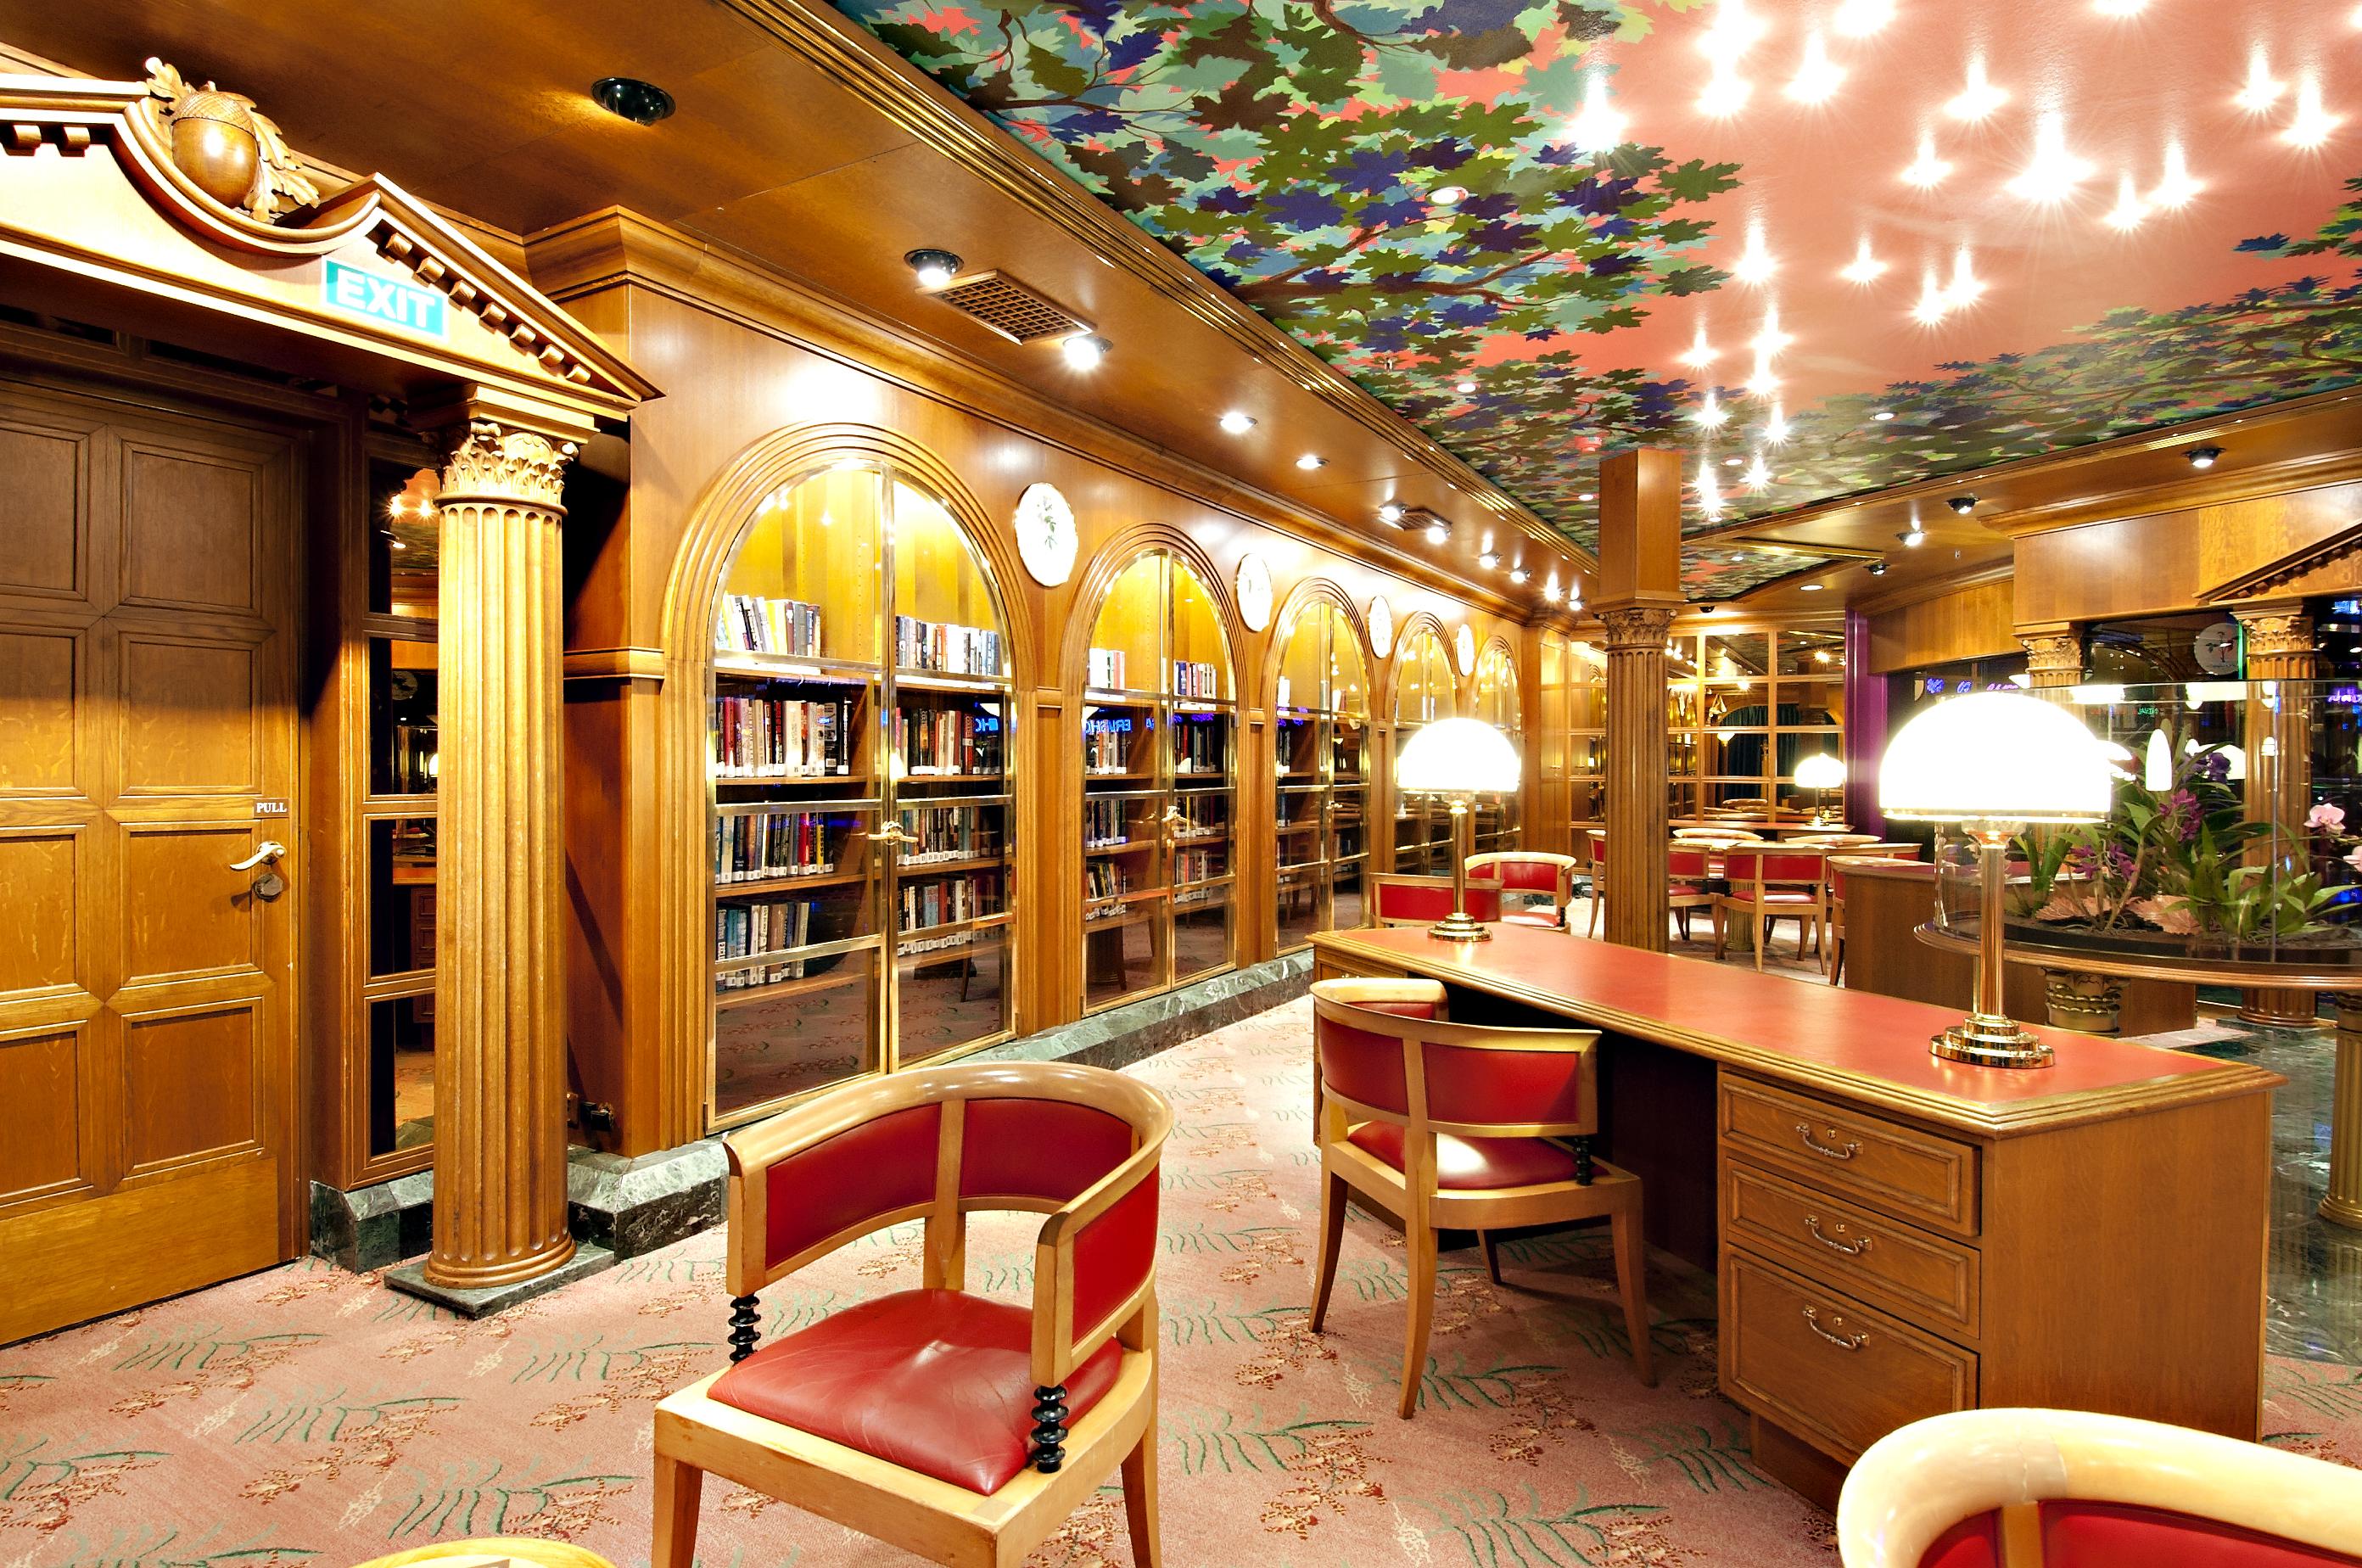 Carnival Sensation Library 2.jpg